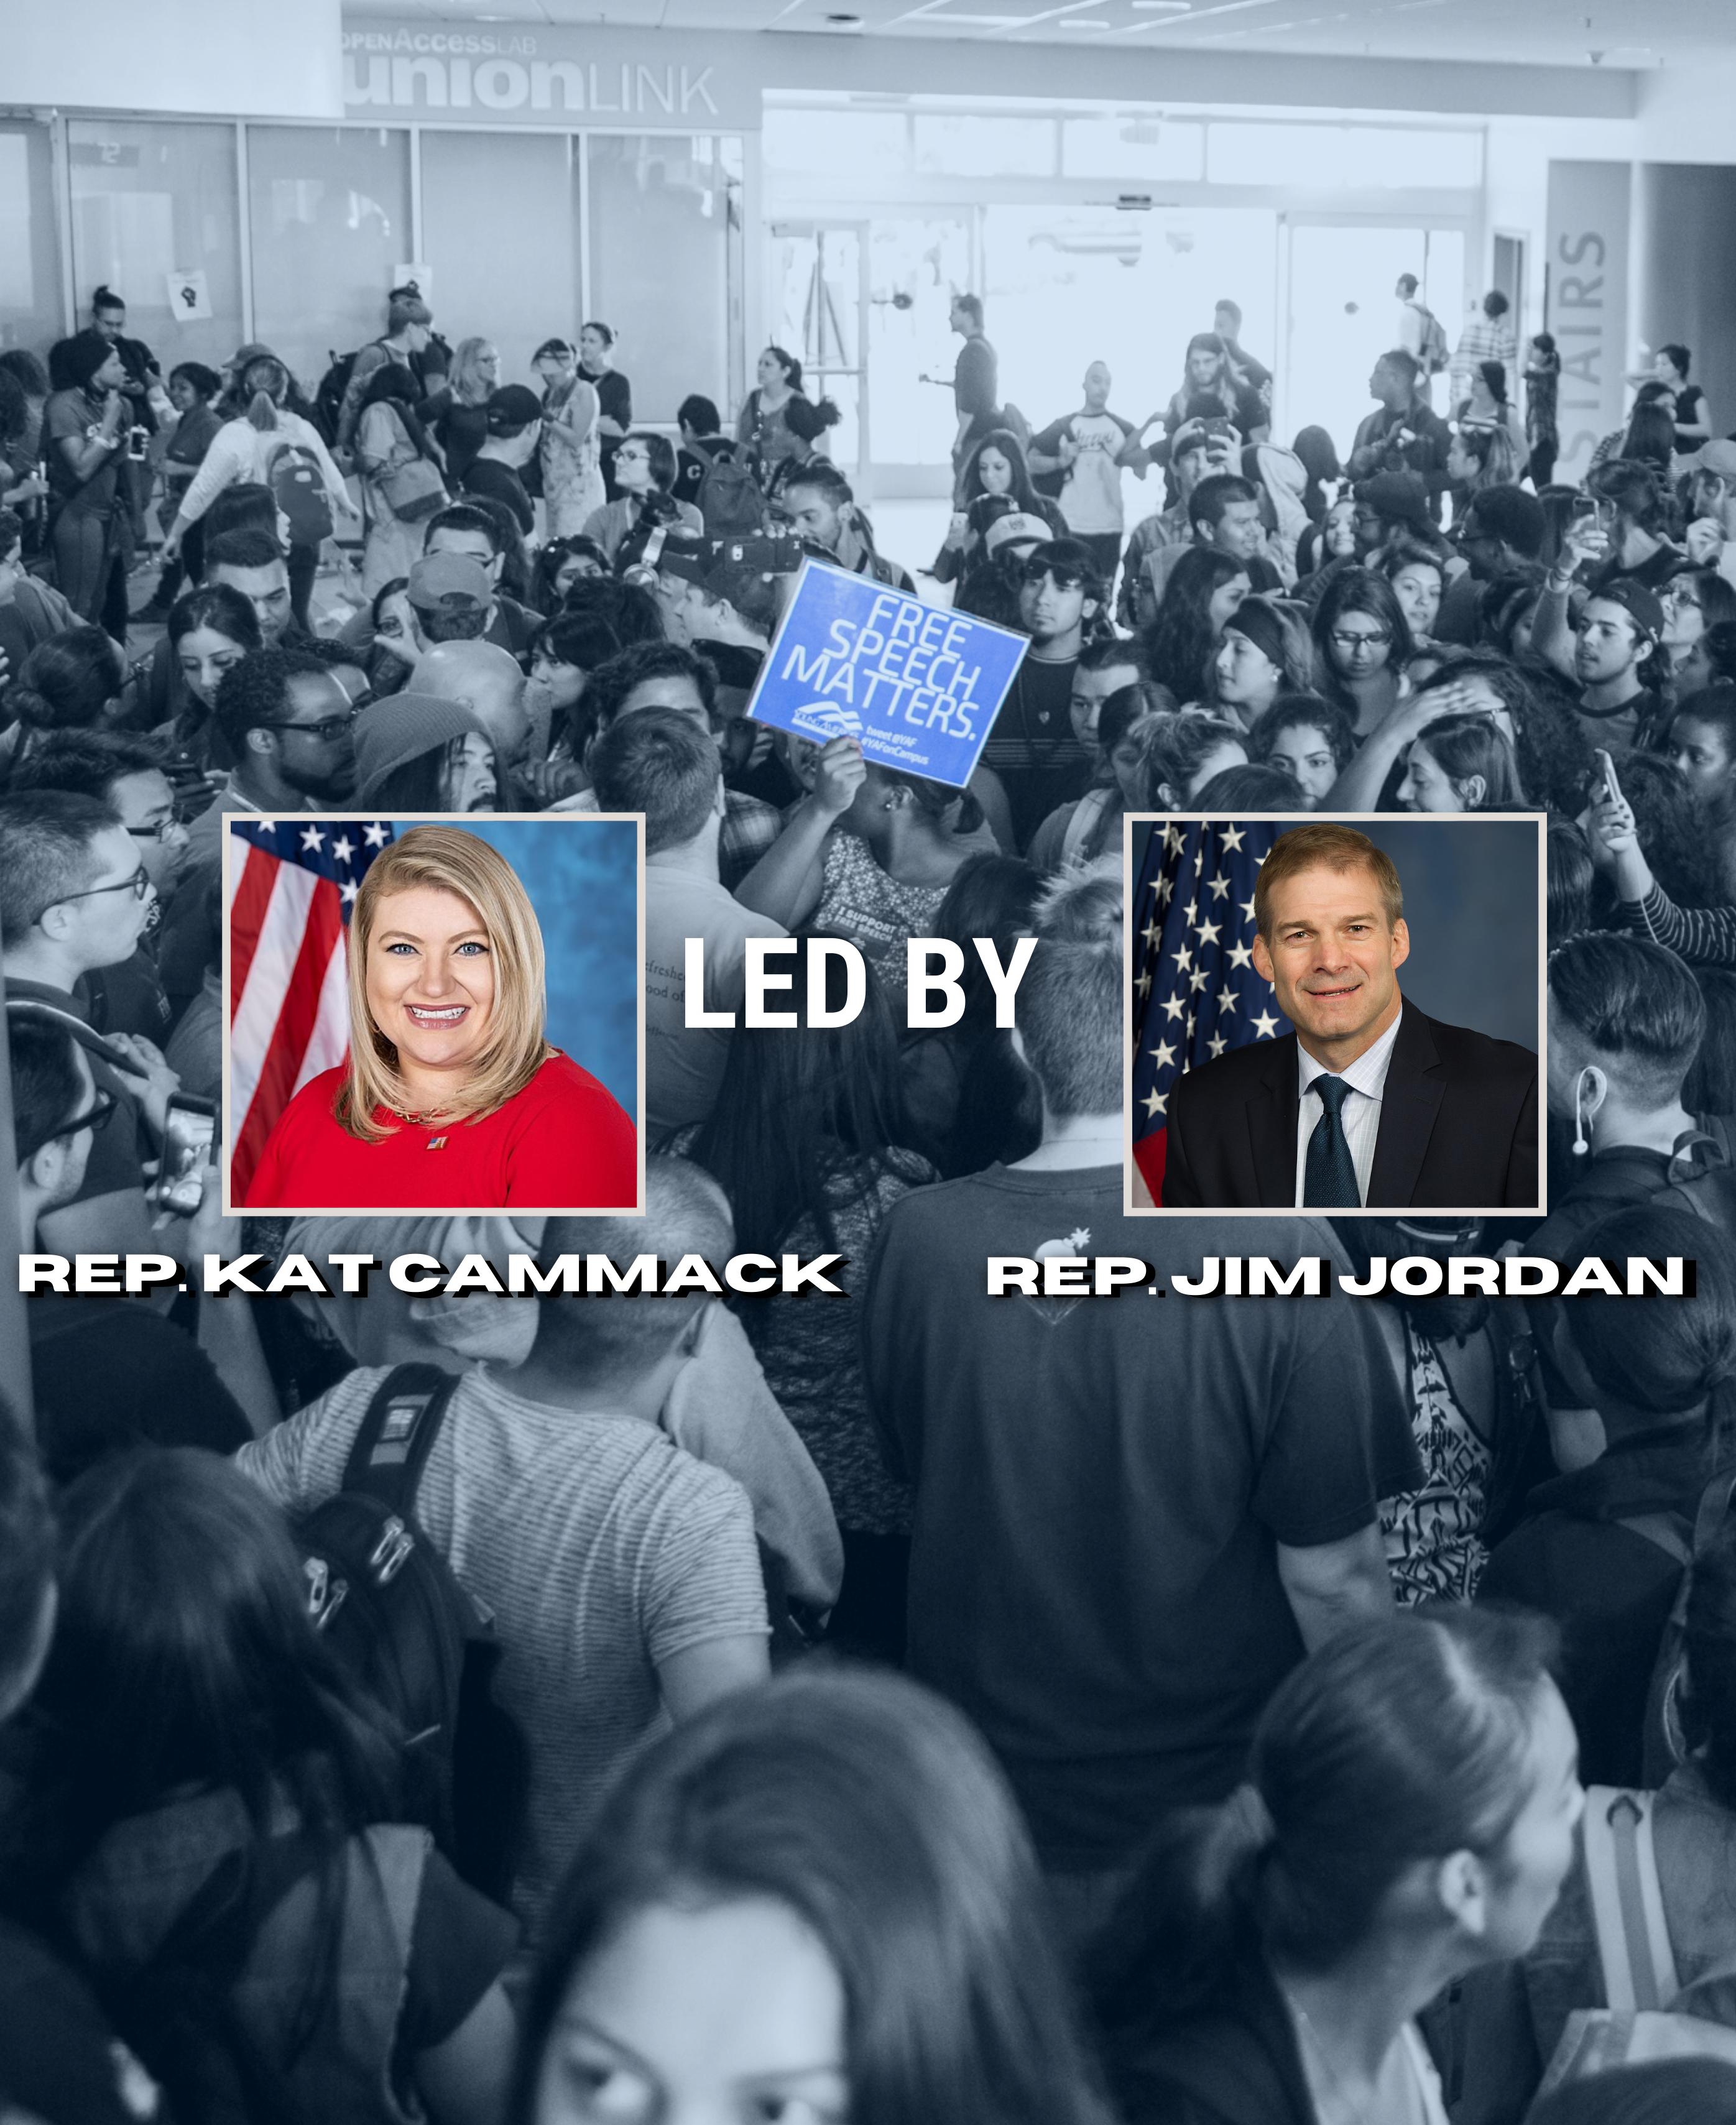 <h1><b>YAF Announces the Congressional Campus Free Speech Caucus</b></h1>